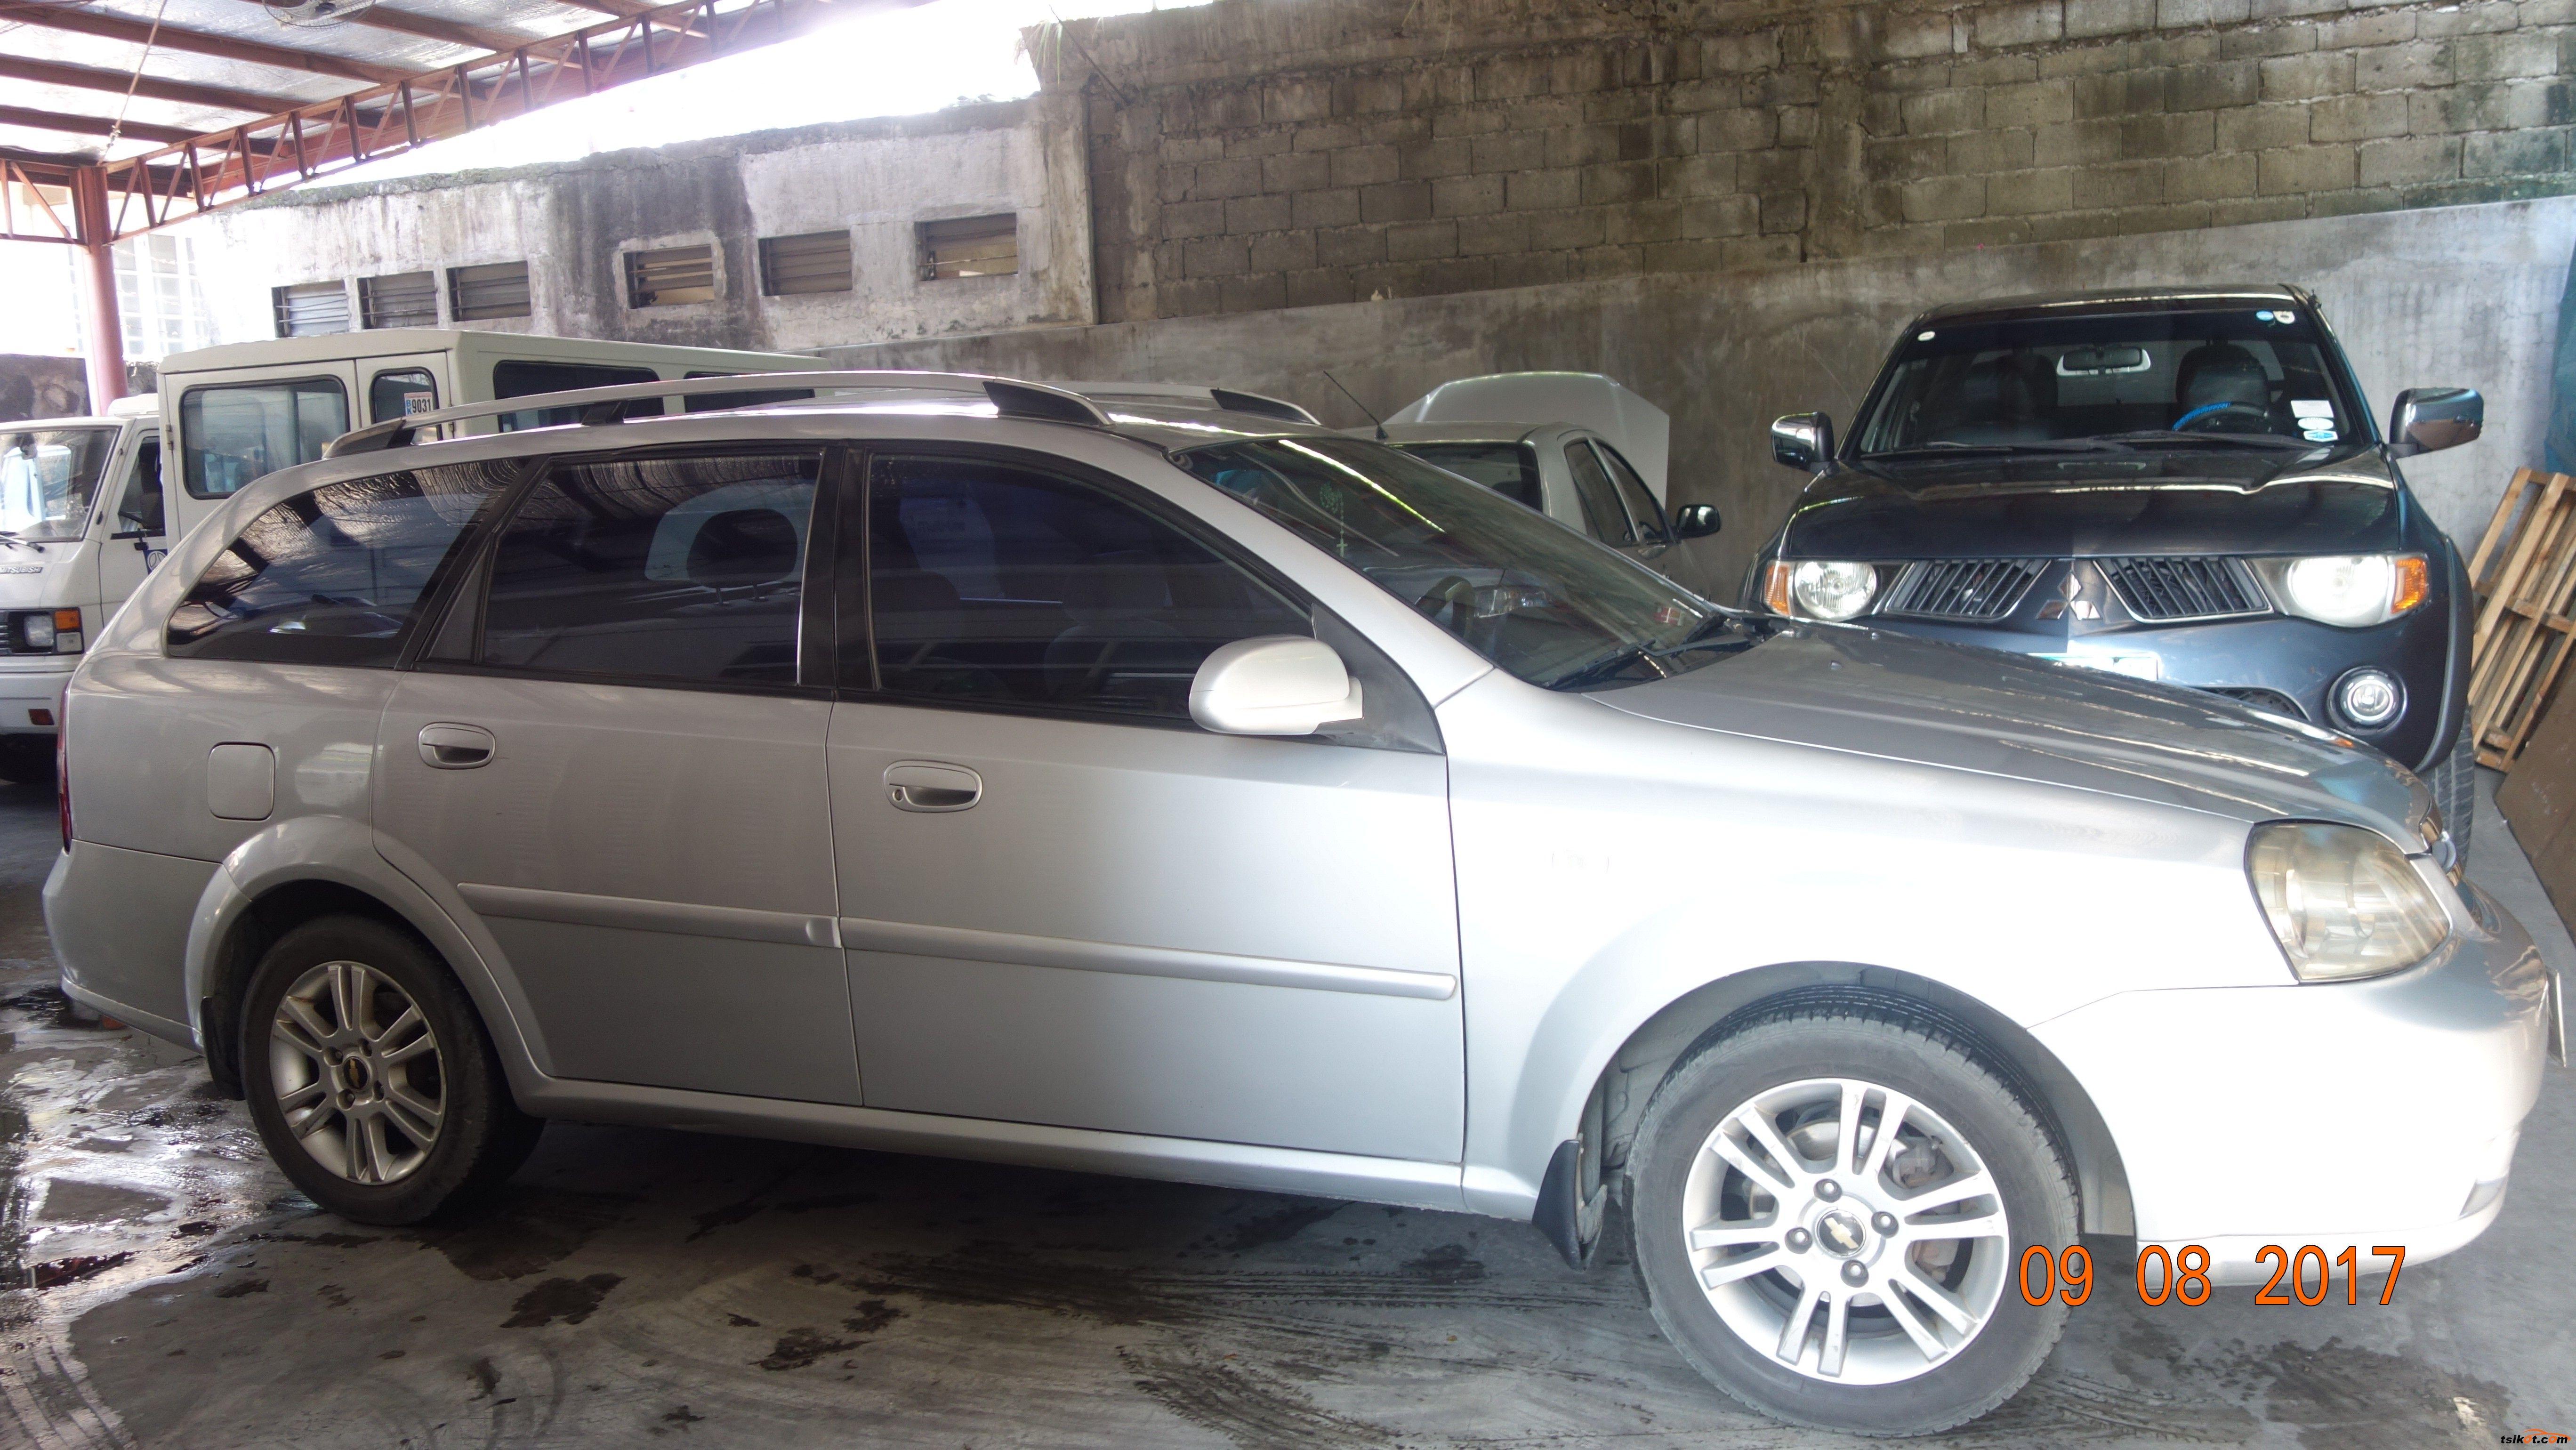 Chevrolet Optra 2006 Car For Sale Metro Manila